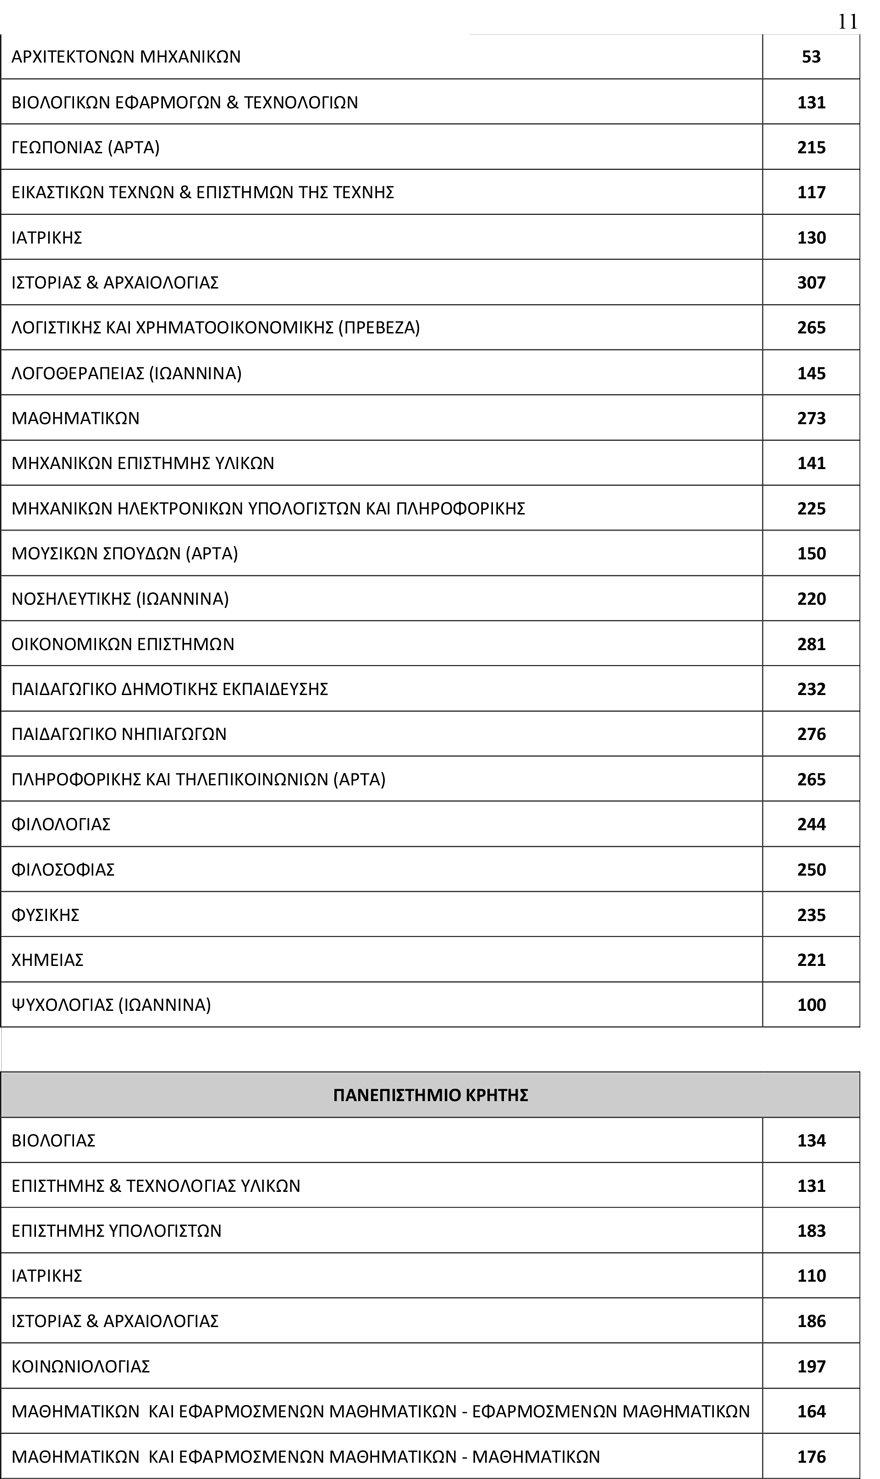 arrithmos_eisakt11 78.335 θα εισαχθούν φέτος στα Πανεπιστήμια - Αυξημένος κατά 3.500 ο αριθμός